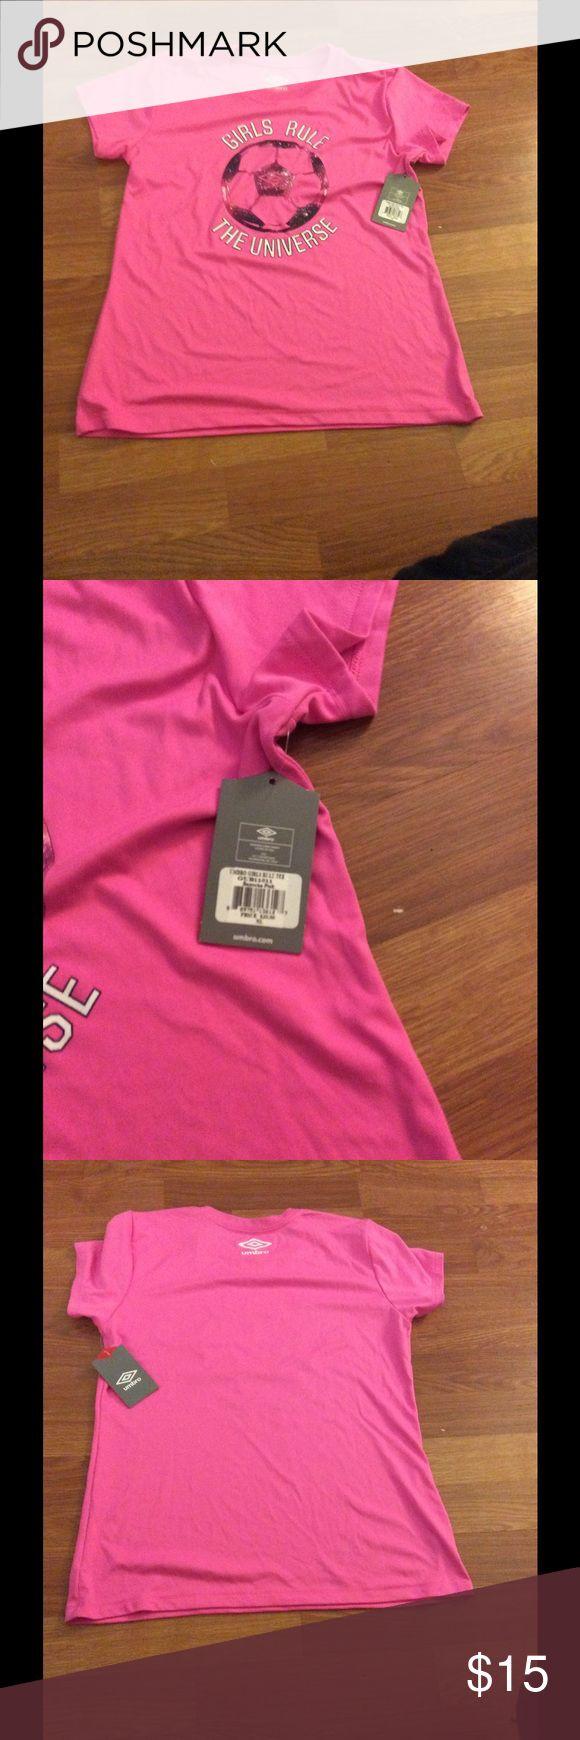 NWT Umbro shirt Says Girls rule the universe.  NWT.  XL from Umro. Umbro Shirts & Tops Tees - Short Sleeve